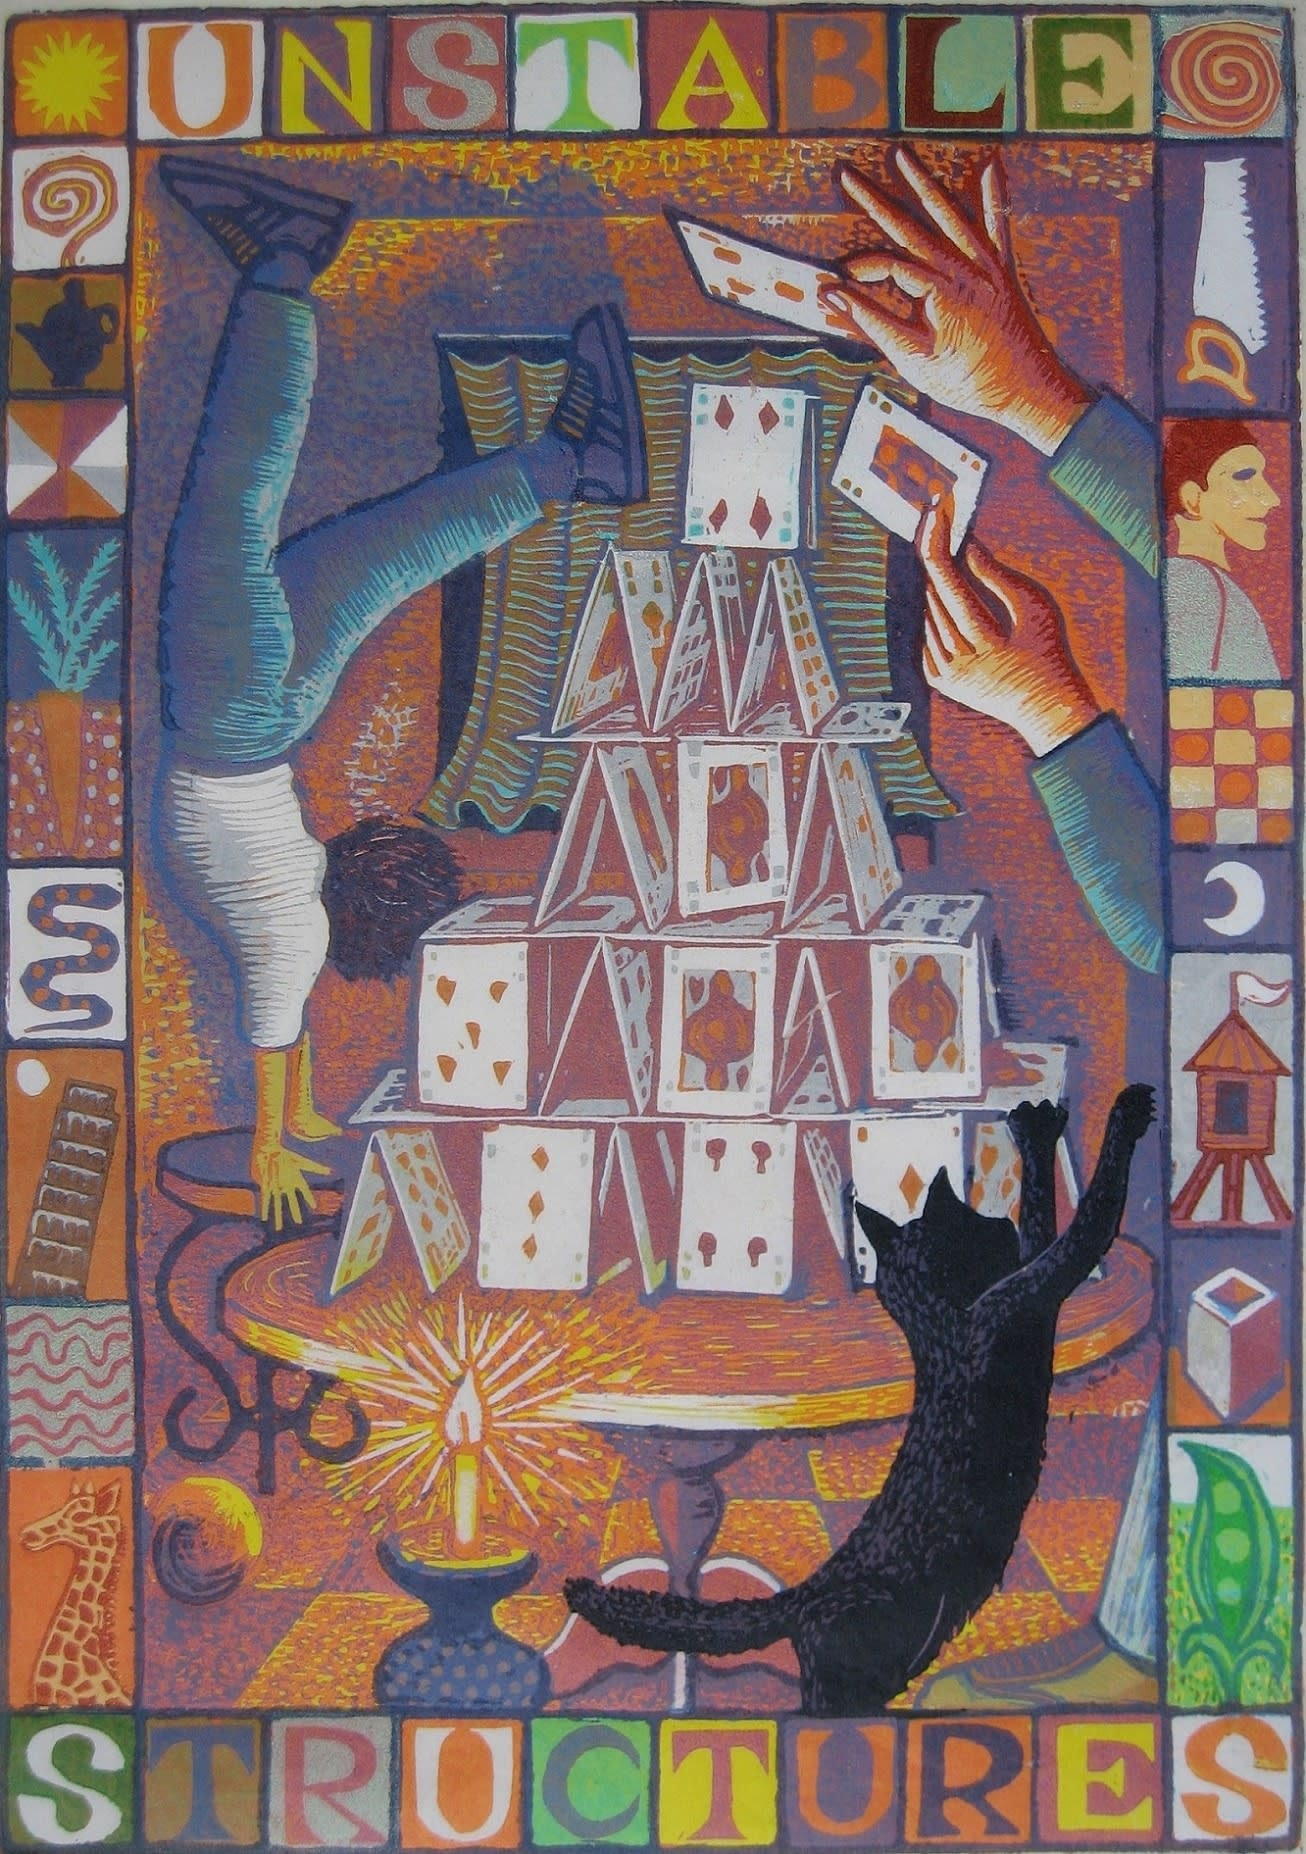 "<span class=""link fancybox-details-link""><a href=""/artists/30-jim-anderson-re/works/10416/"">View Detail Page</a></span><div class=""artist""><span class=""artist""><strong>Jim Anderson RE</strong></span></div><div class=""title""><em>Children's Games VII (Unstable Structures)</em></div><div class=""medium"">linocut</div><div class=""dimensions"">Frame: 45 x 33 cm<br /> Artwork: 29 x 21 cm<br /> </div><div class=""price"">£200.00</div>"